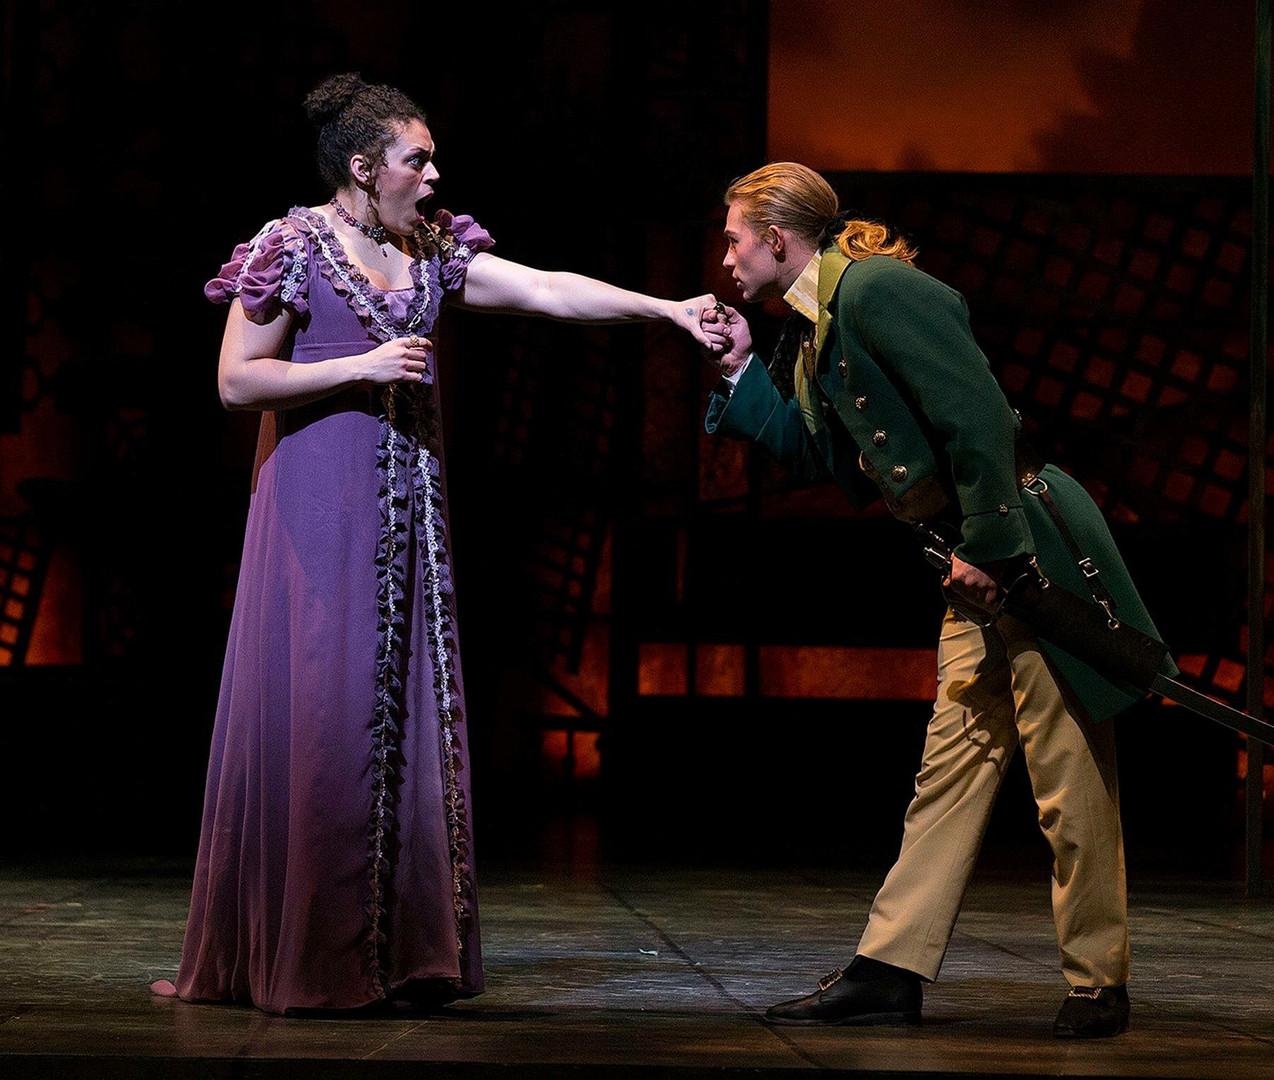 Mistaken Identity in Twelfth Night